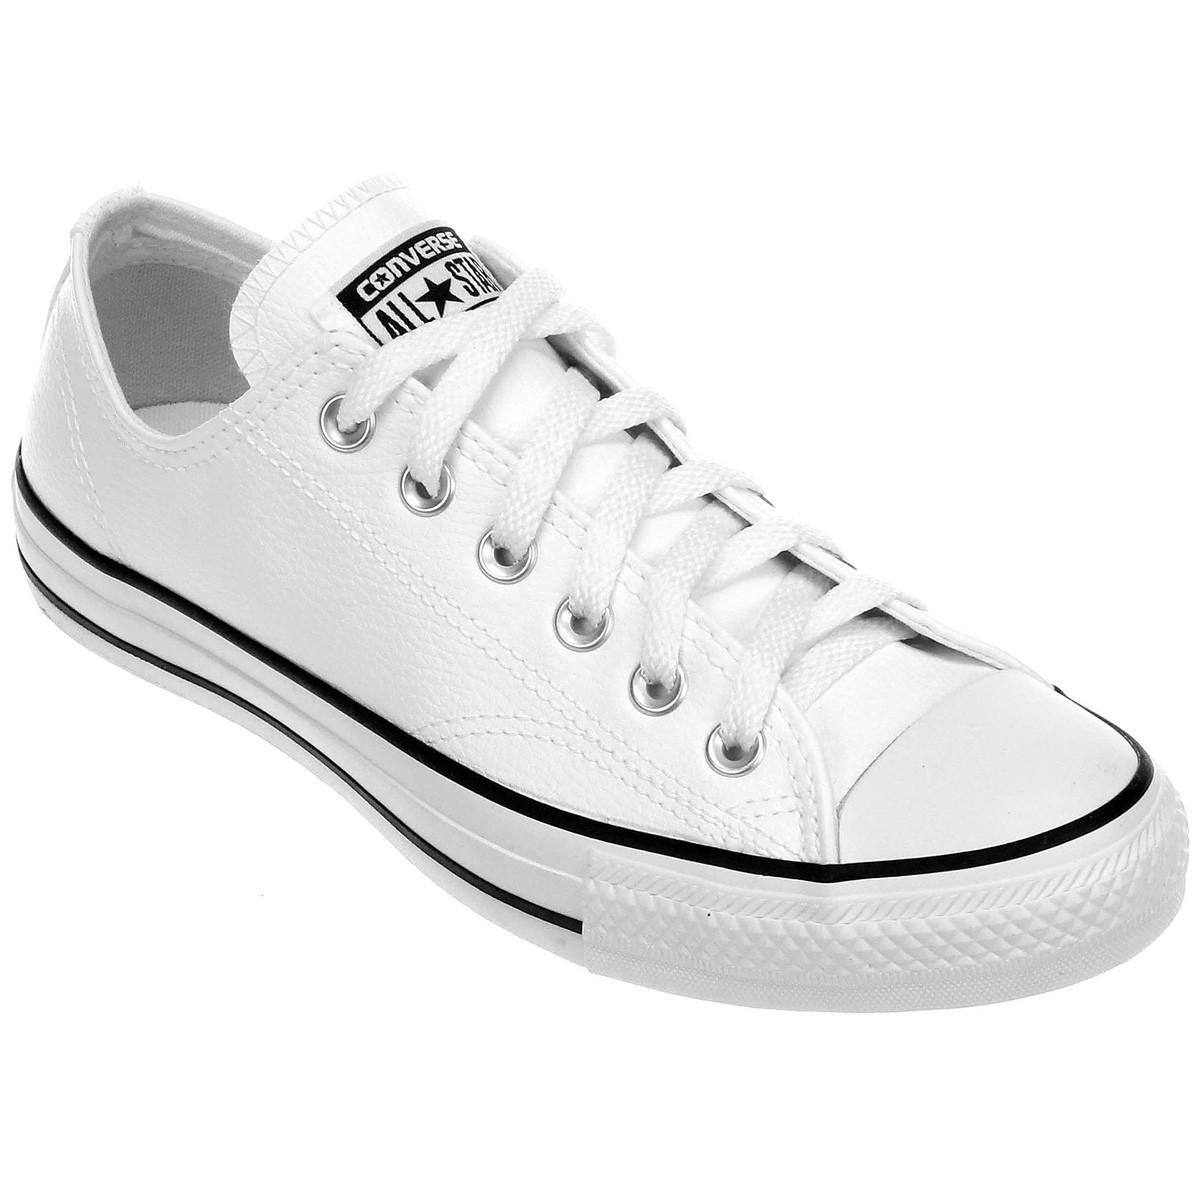 ea0a00c7a11 Tênis All Star Converse Malden CT0328.0004 - Branco - Calçados ...